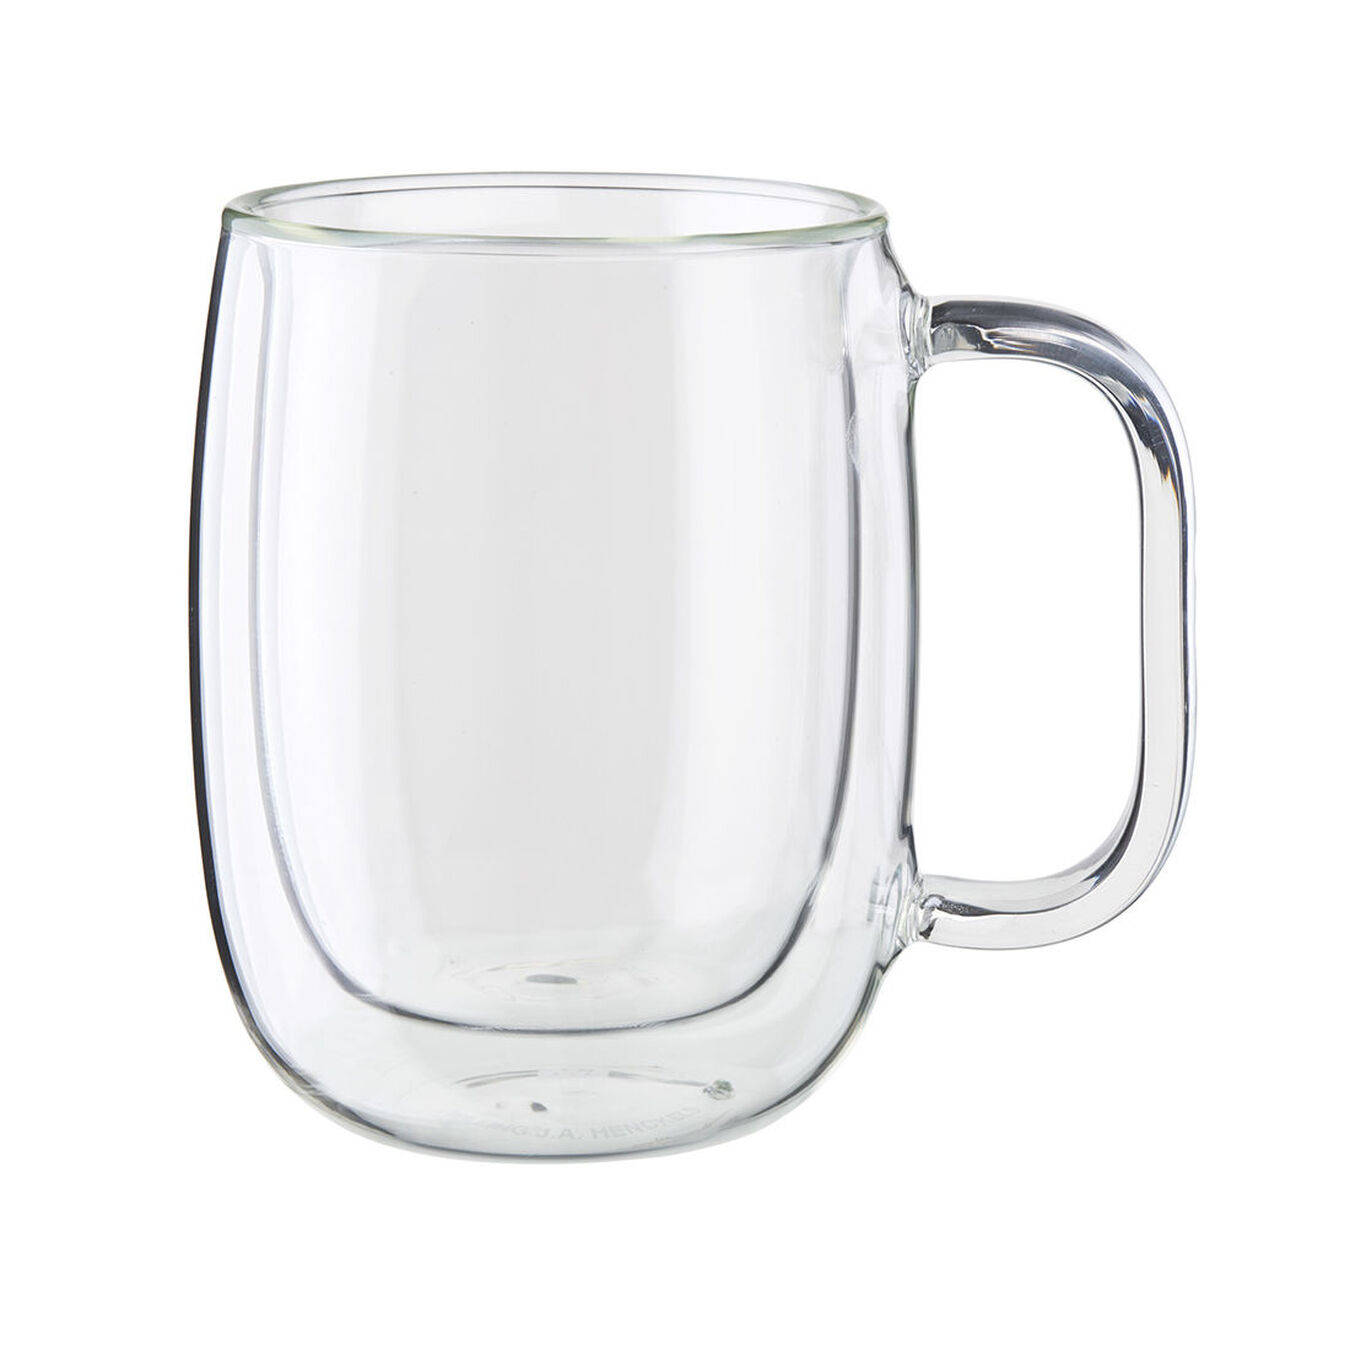 8-pc Double-Wall Glass Coffee Mug Set,,large 2